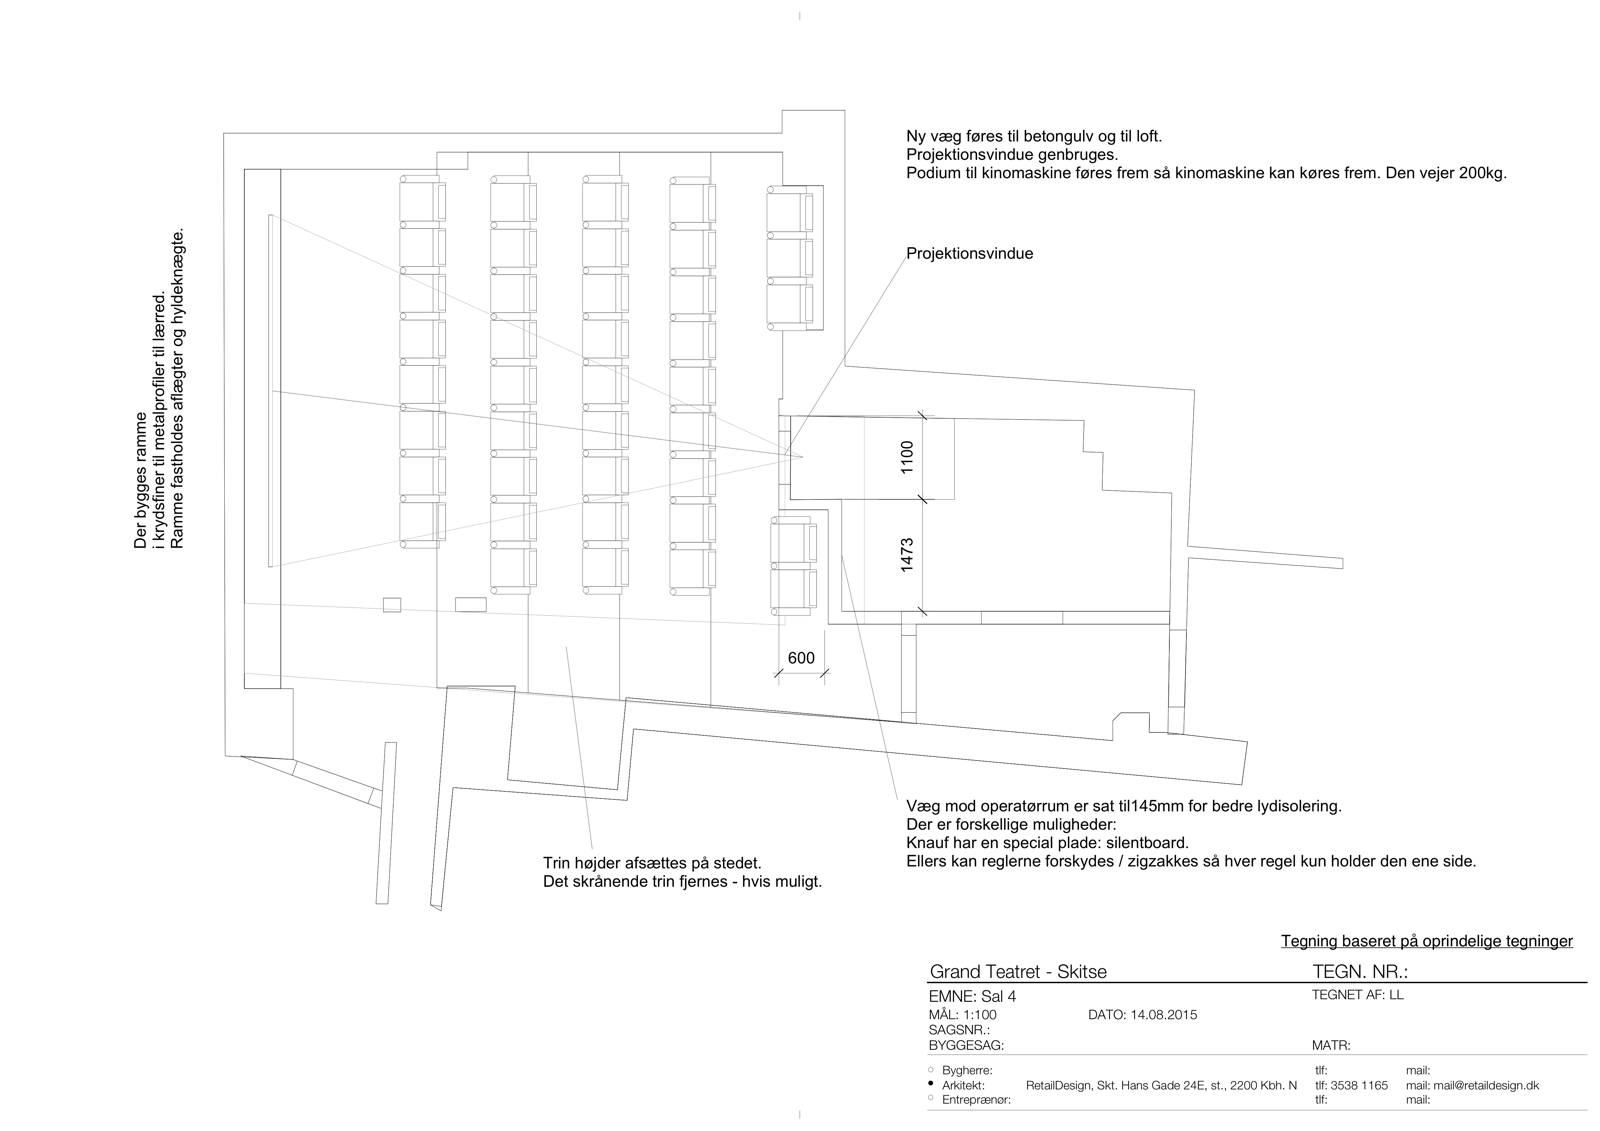 Biograf – Grand Teatret (skitse, sal)